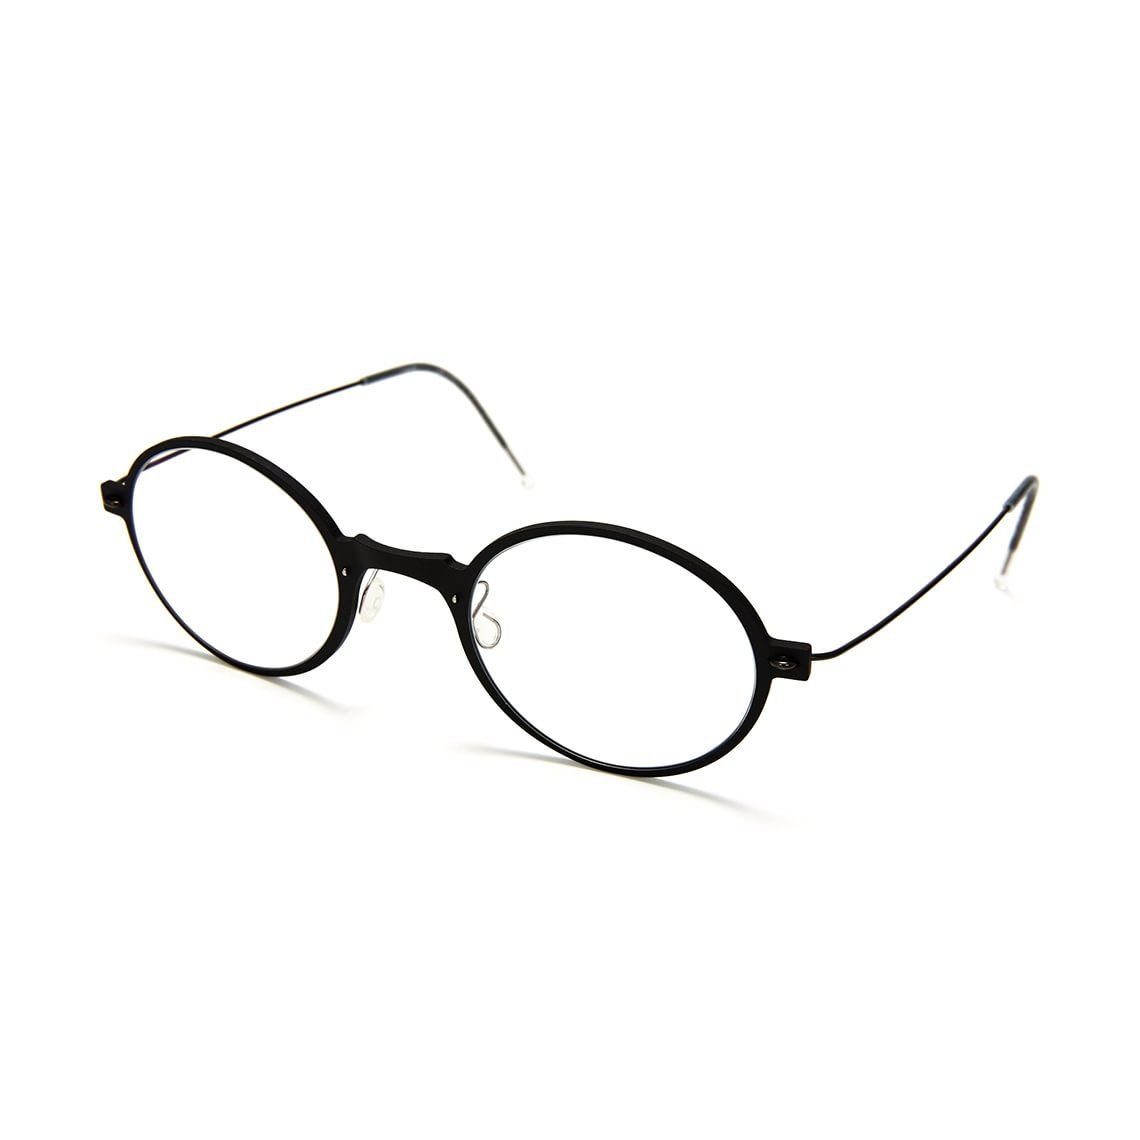 title} (med bilder) | Glasögon, Temples, Läsglasögon